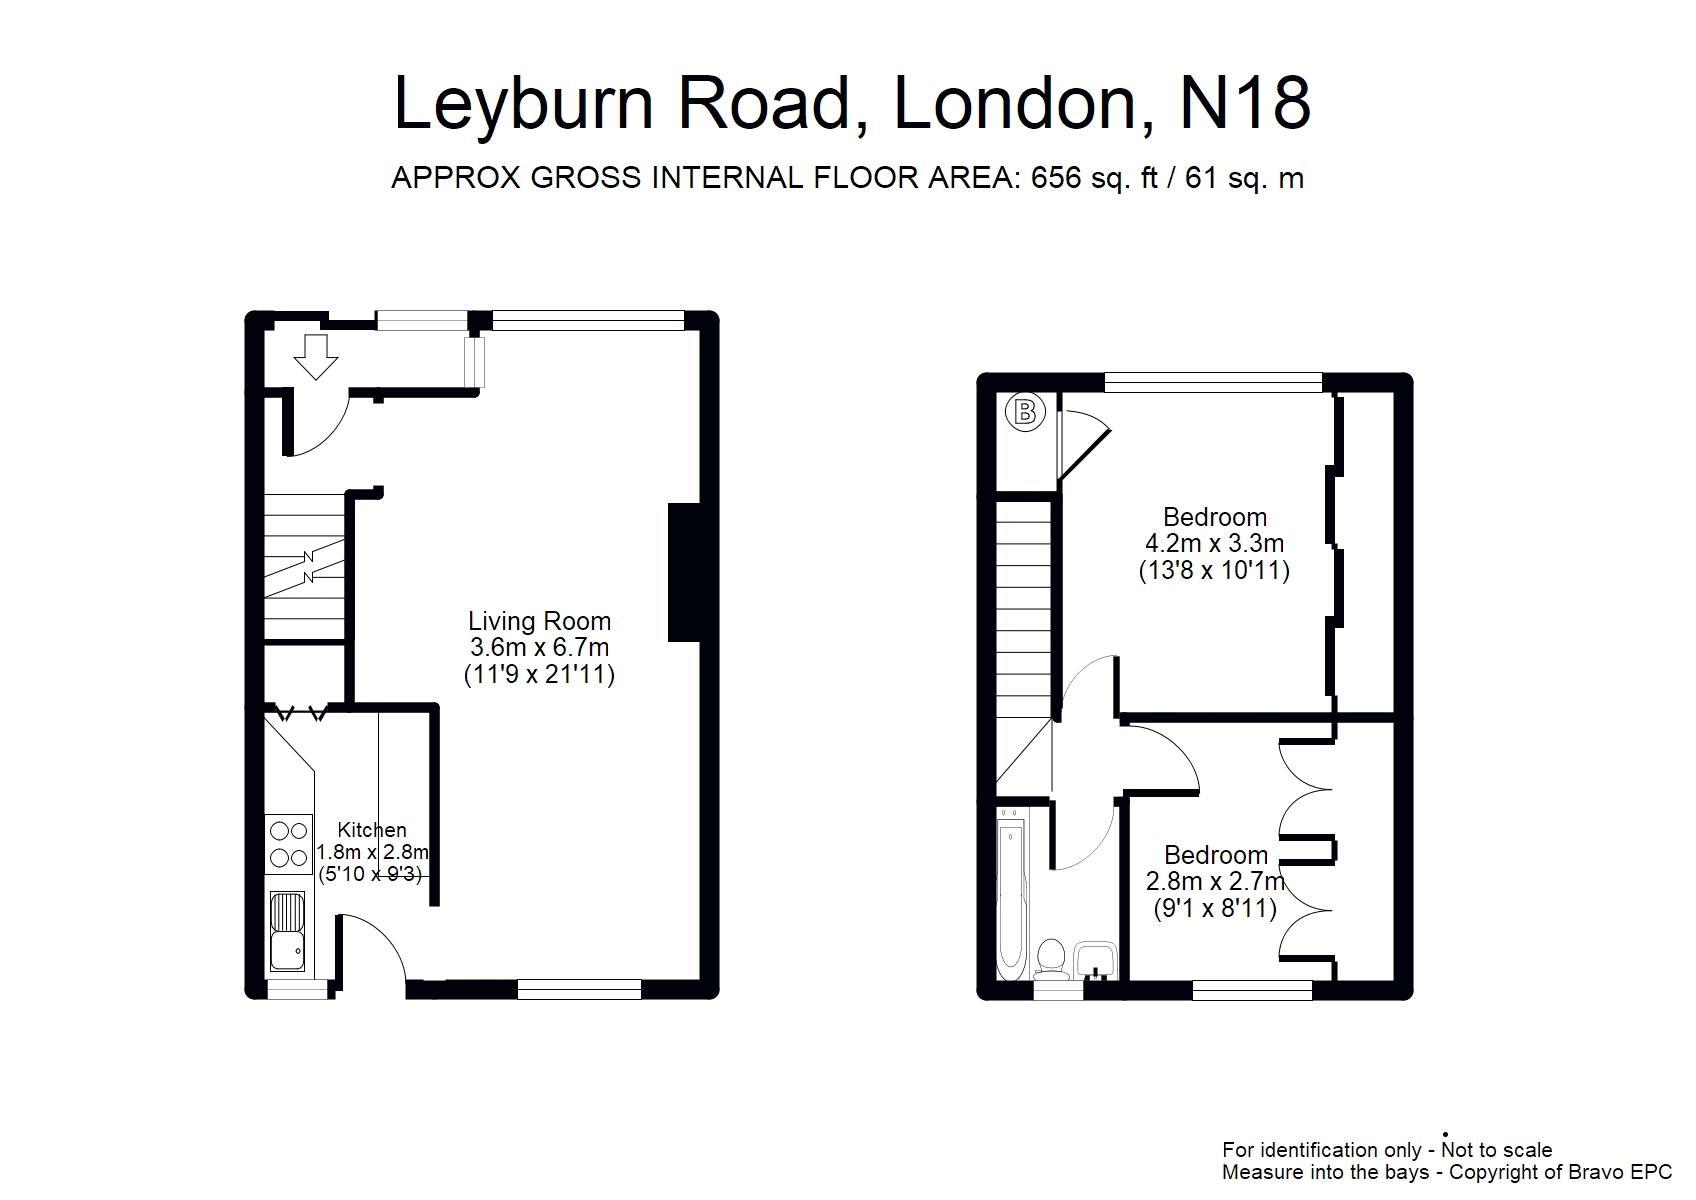 Leyburn Road